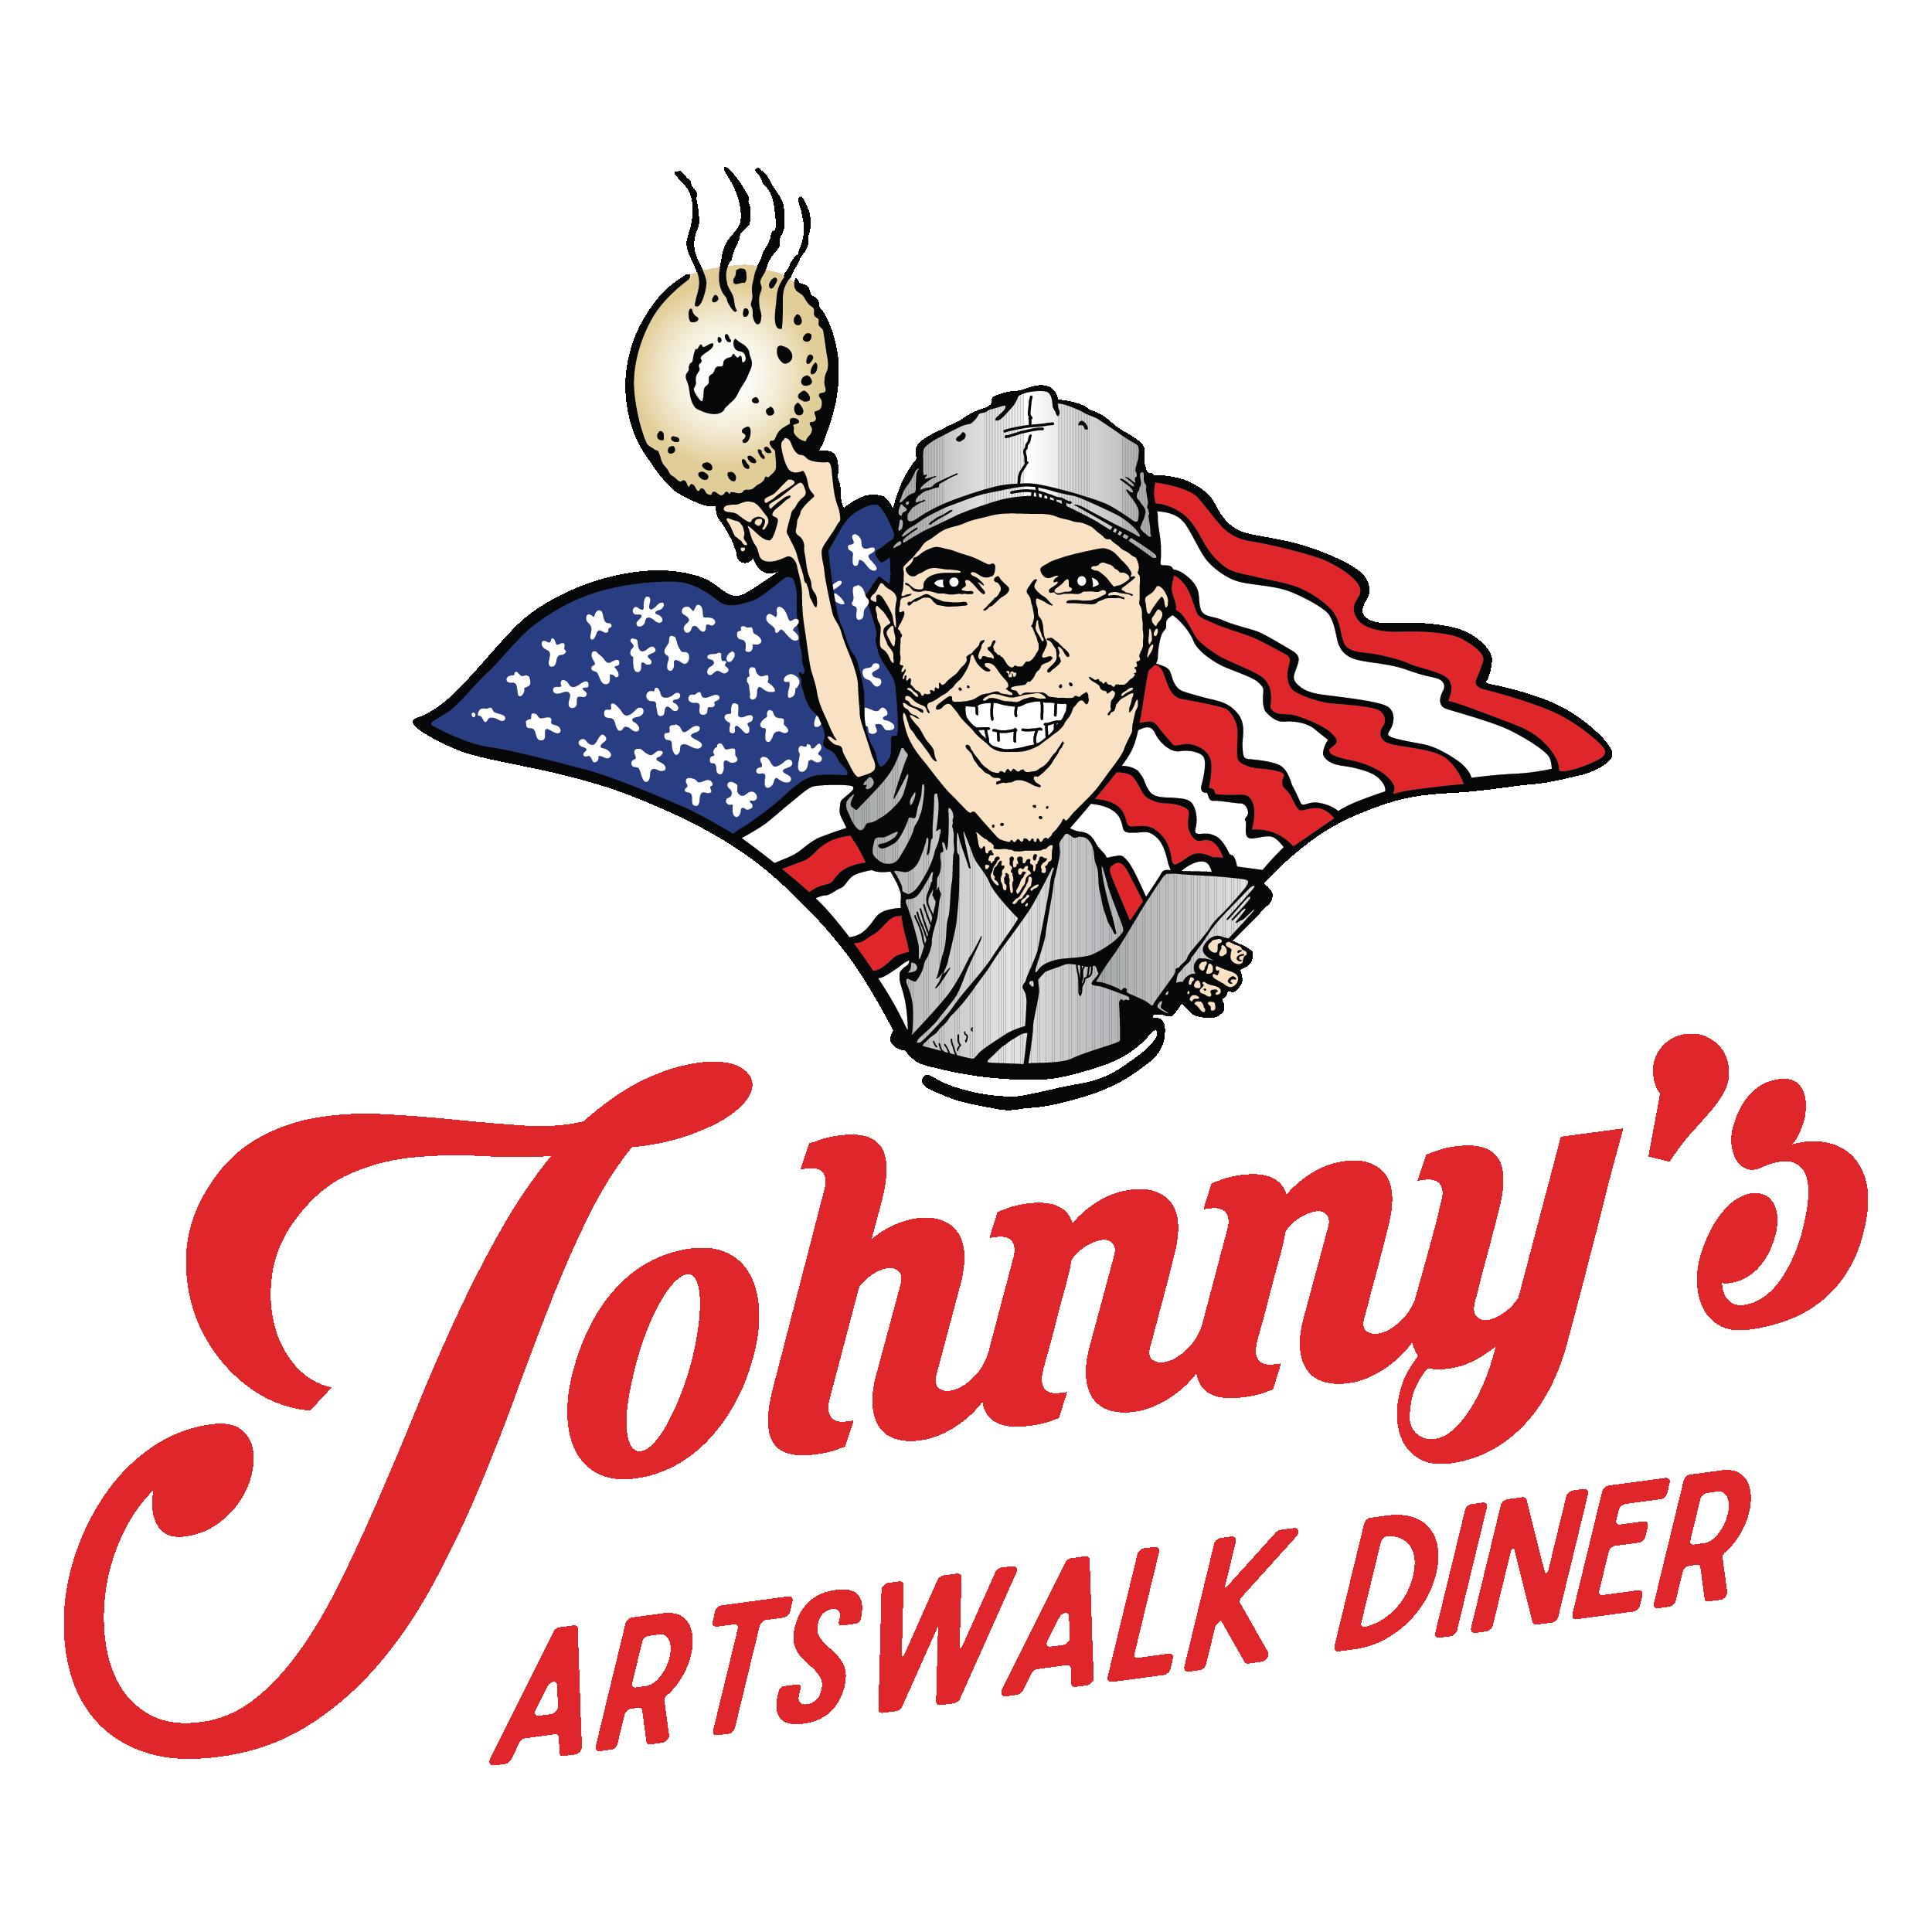 Johnny's ArtsWalk Diner